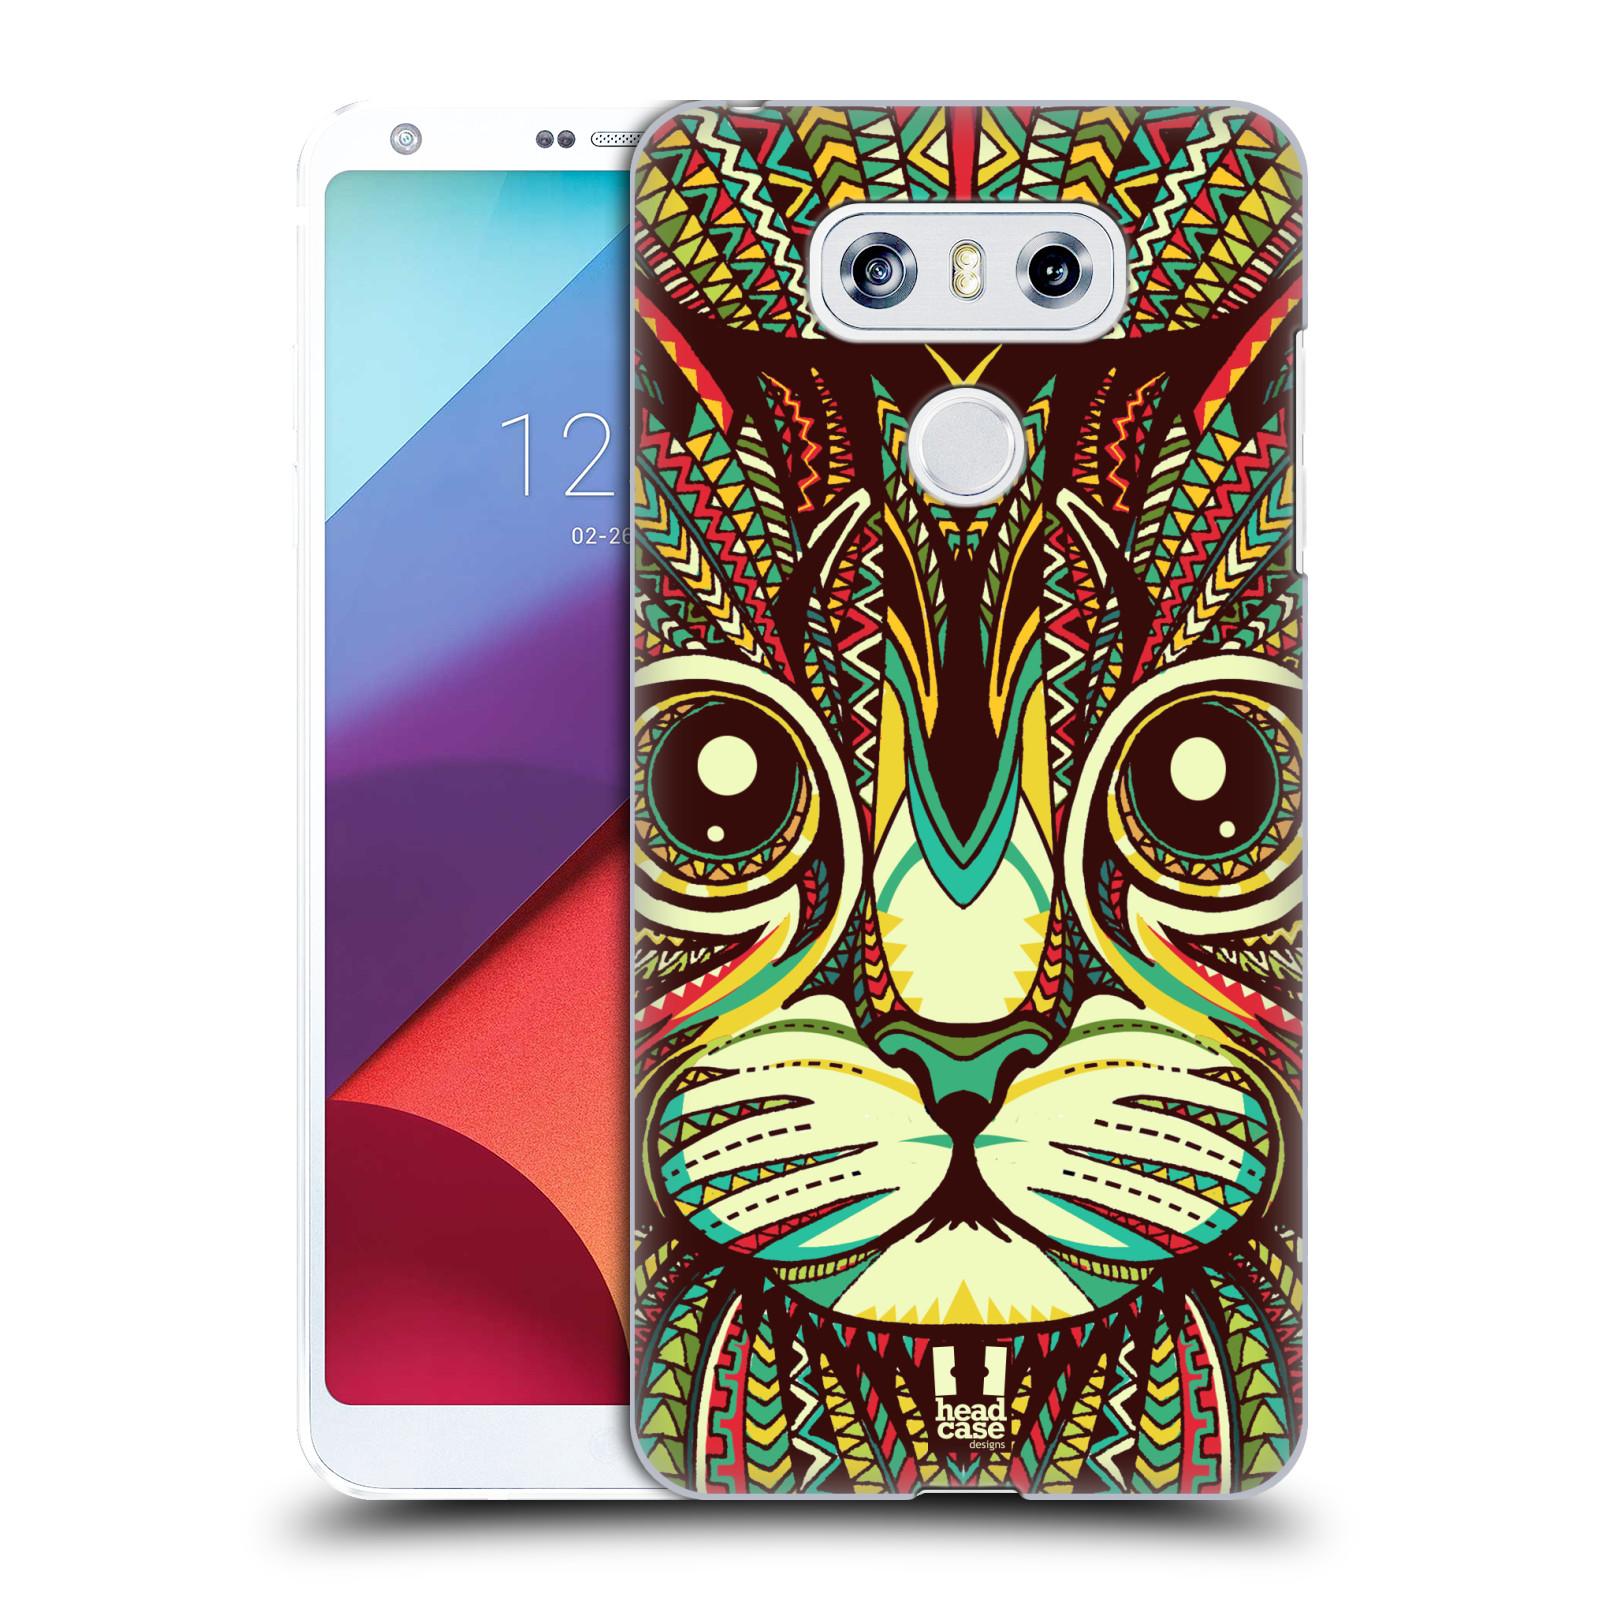 Plastové pouzdro na mobil LG G6 - Head Case AZTEC KOČKA